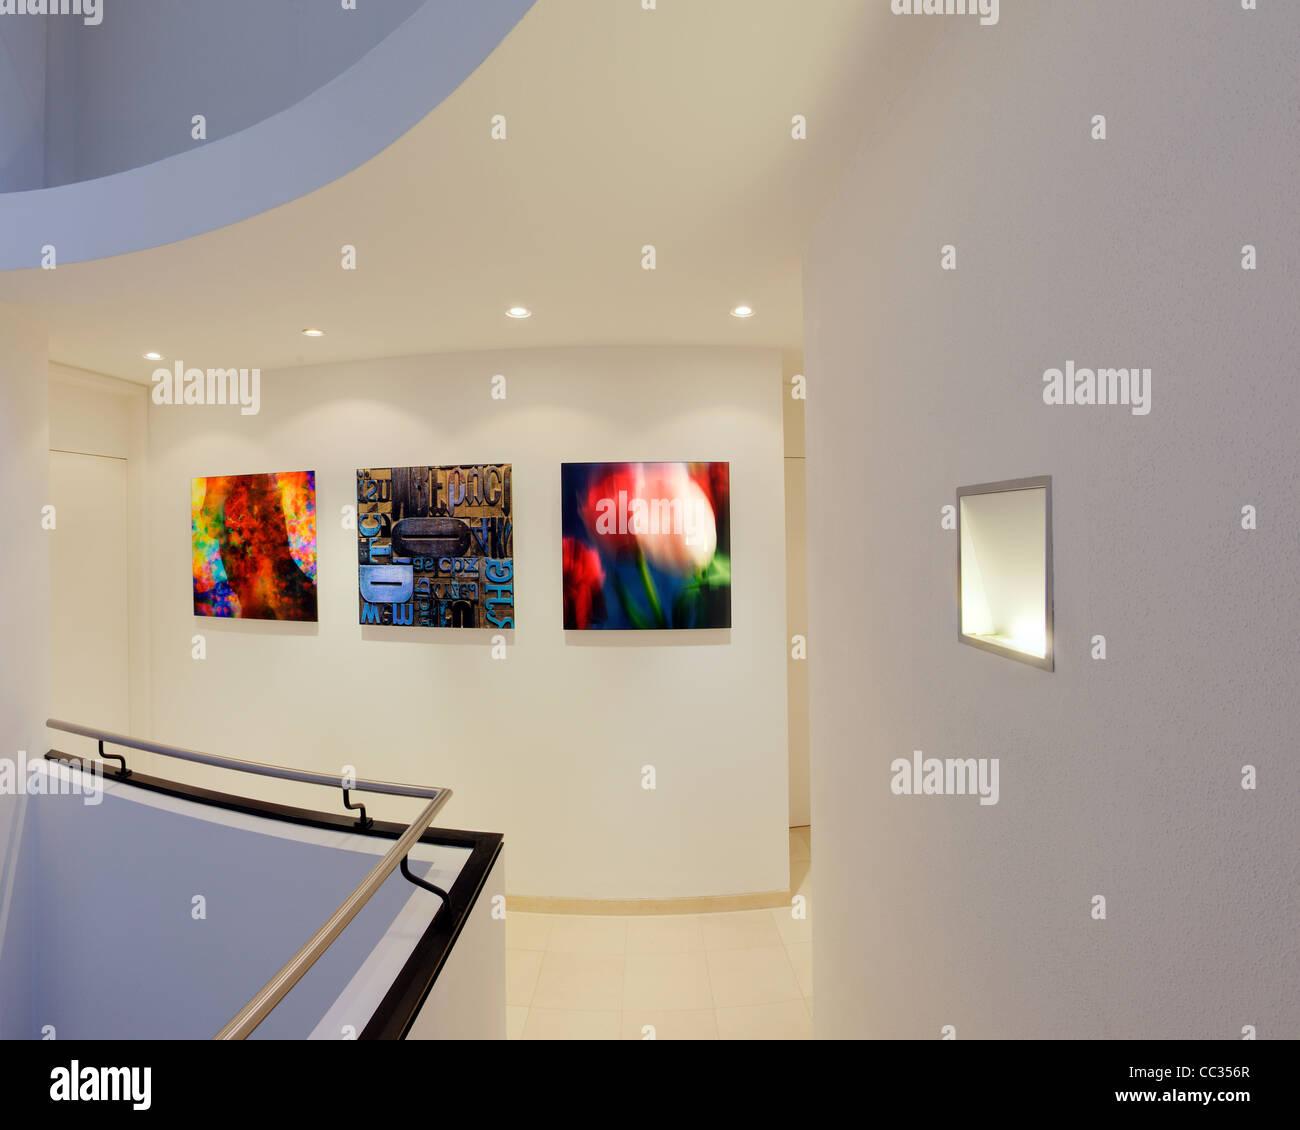 Architettura: galleria privata Display (Germania/Bad Toelz) Immagini Stock